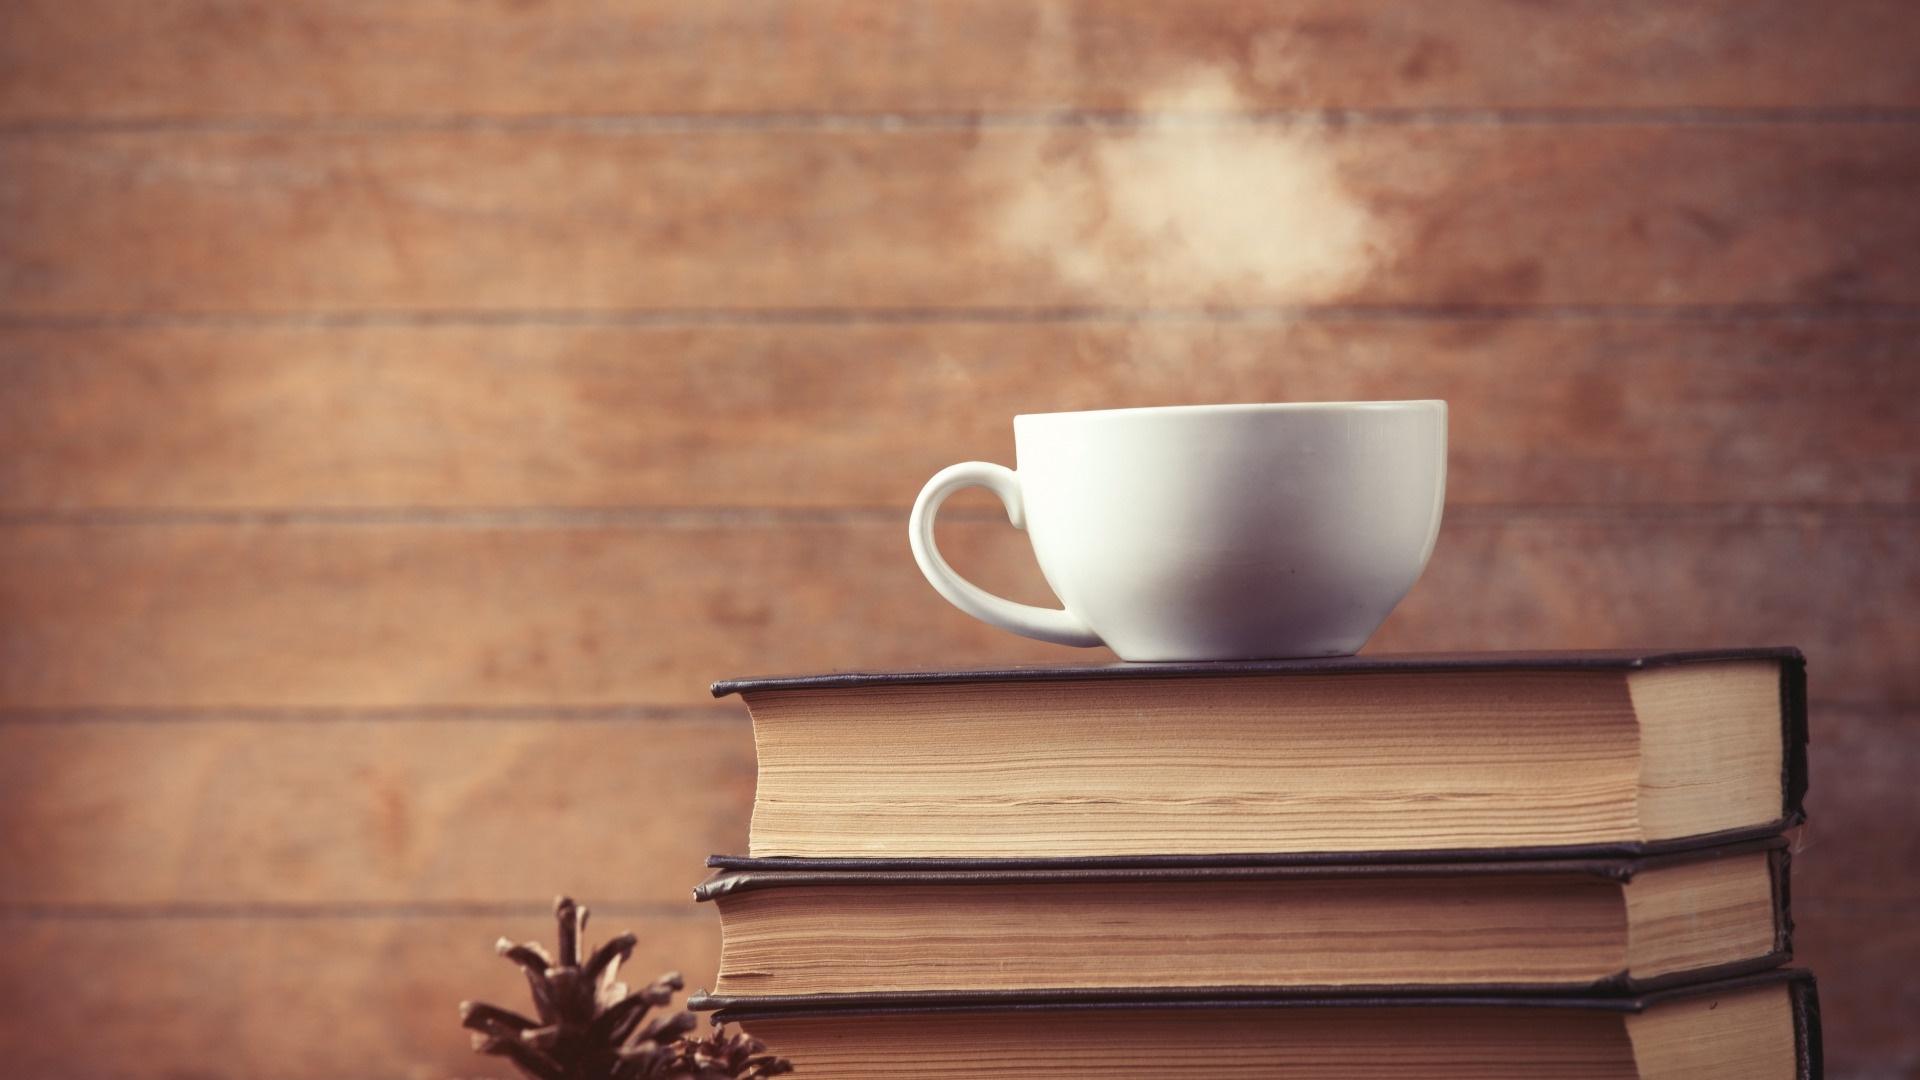 Book And Coffee desktop wallpaper hd